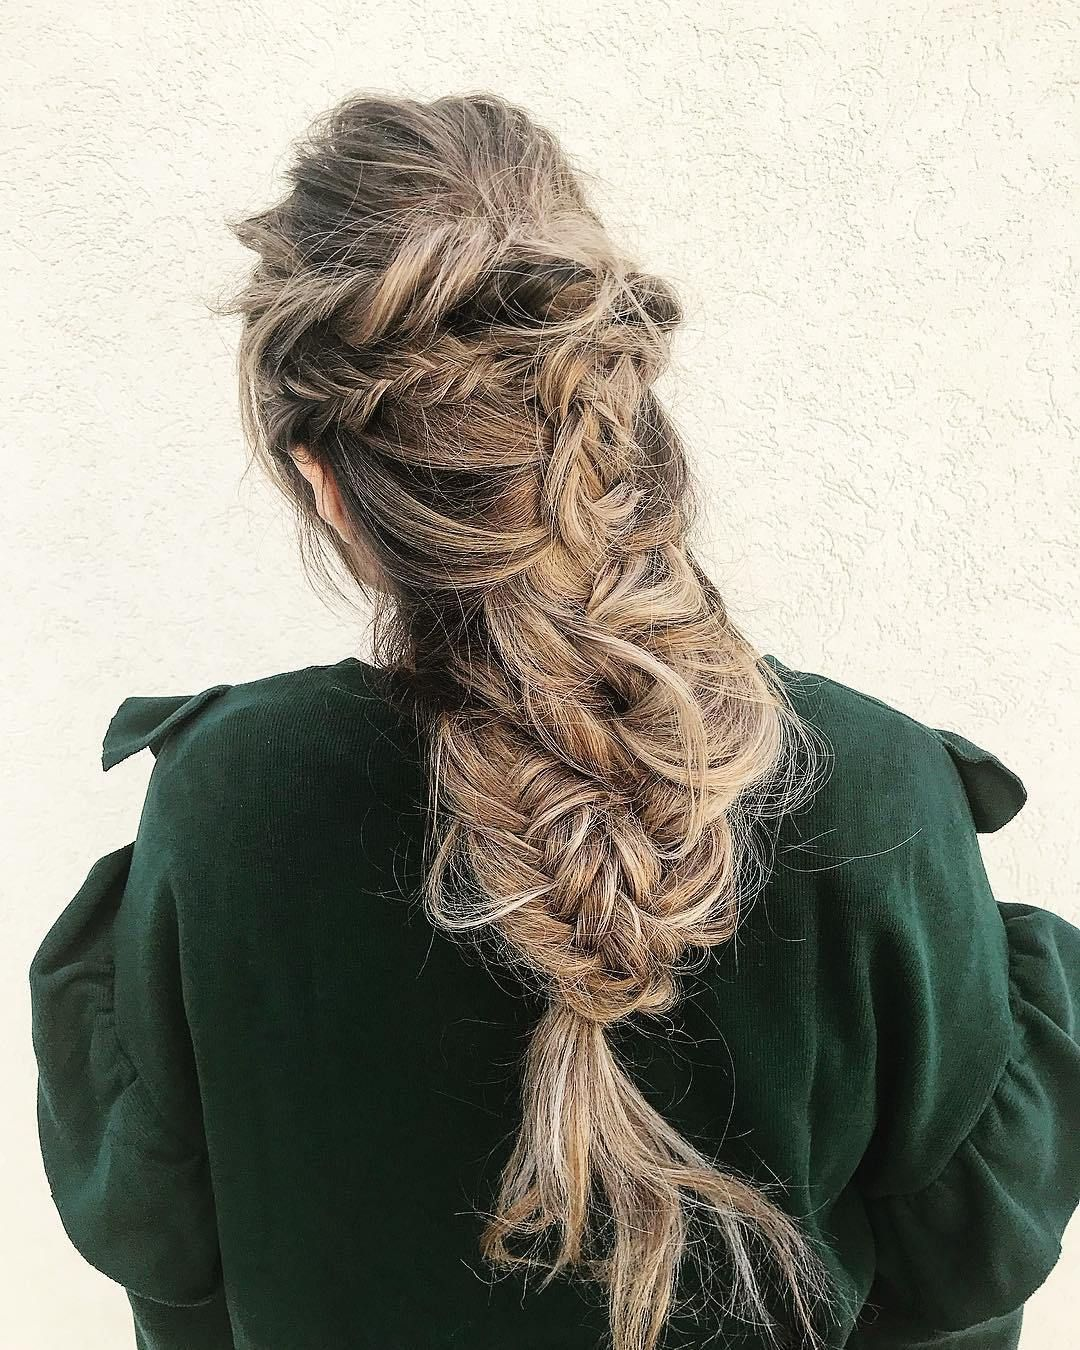 Pretty Fishtail and Loose braids hairstyle #braids #fishtail #hairtyles #bohohair